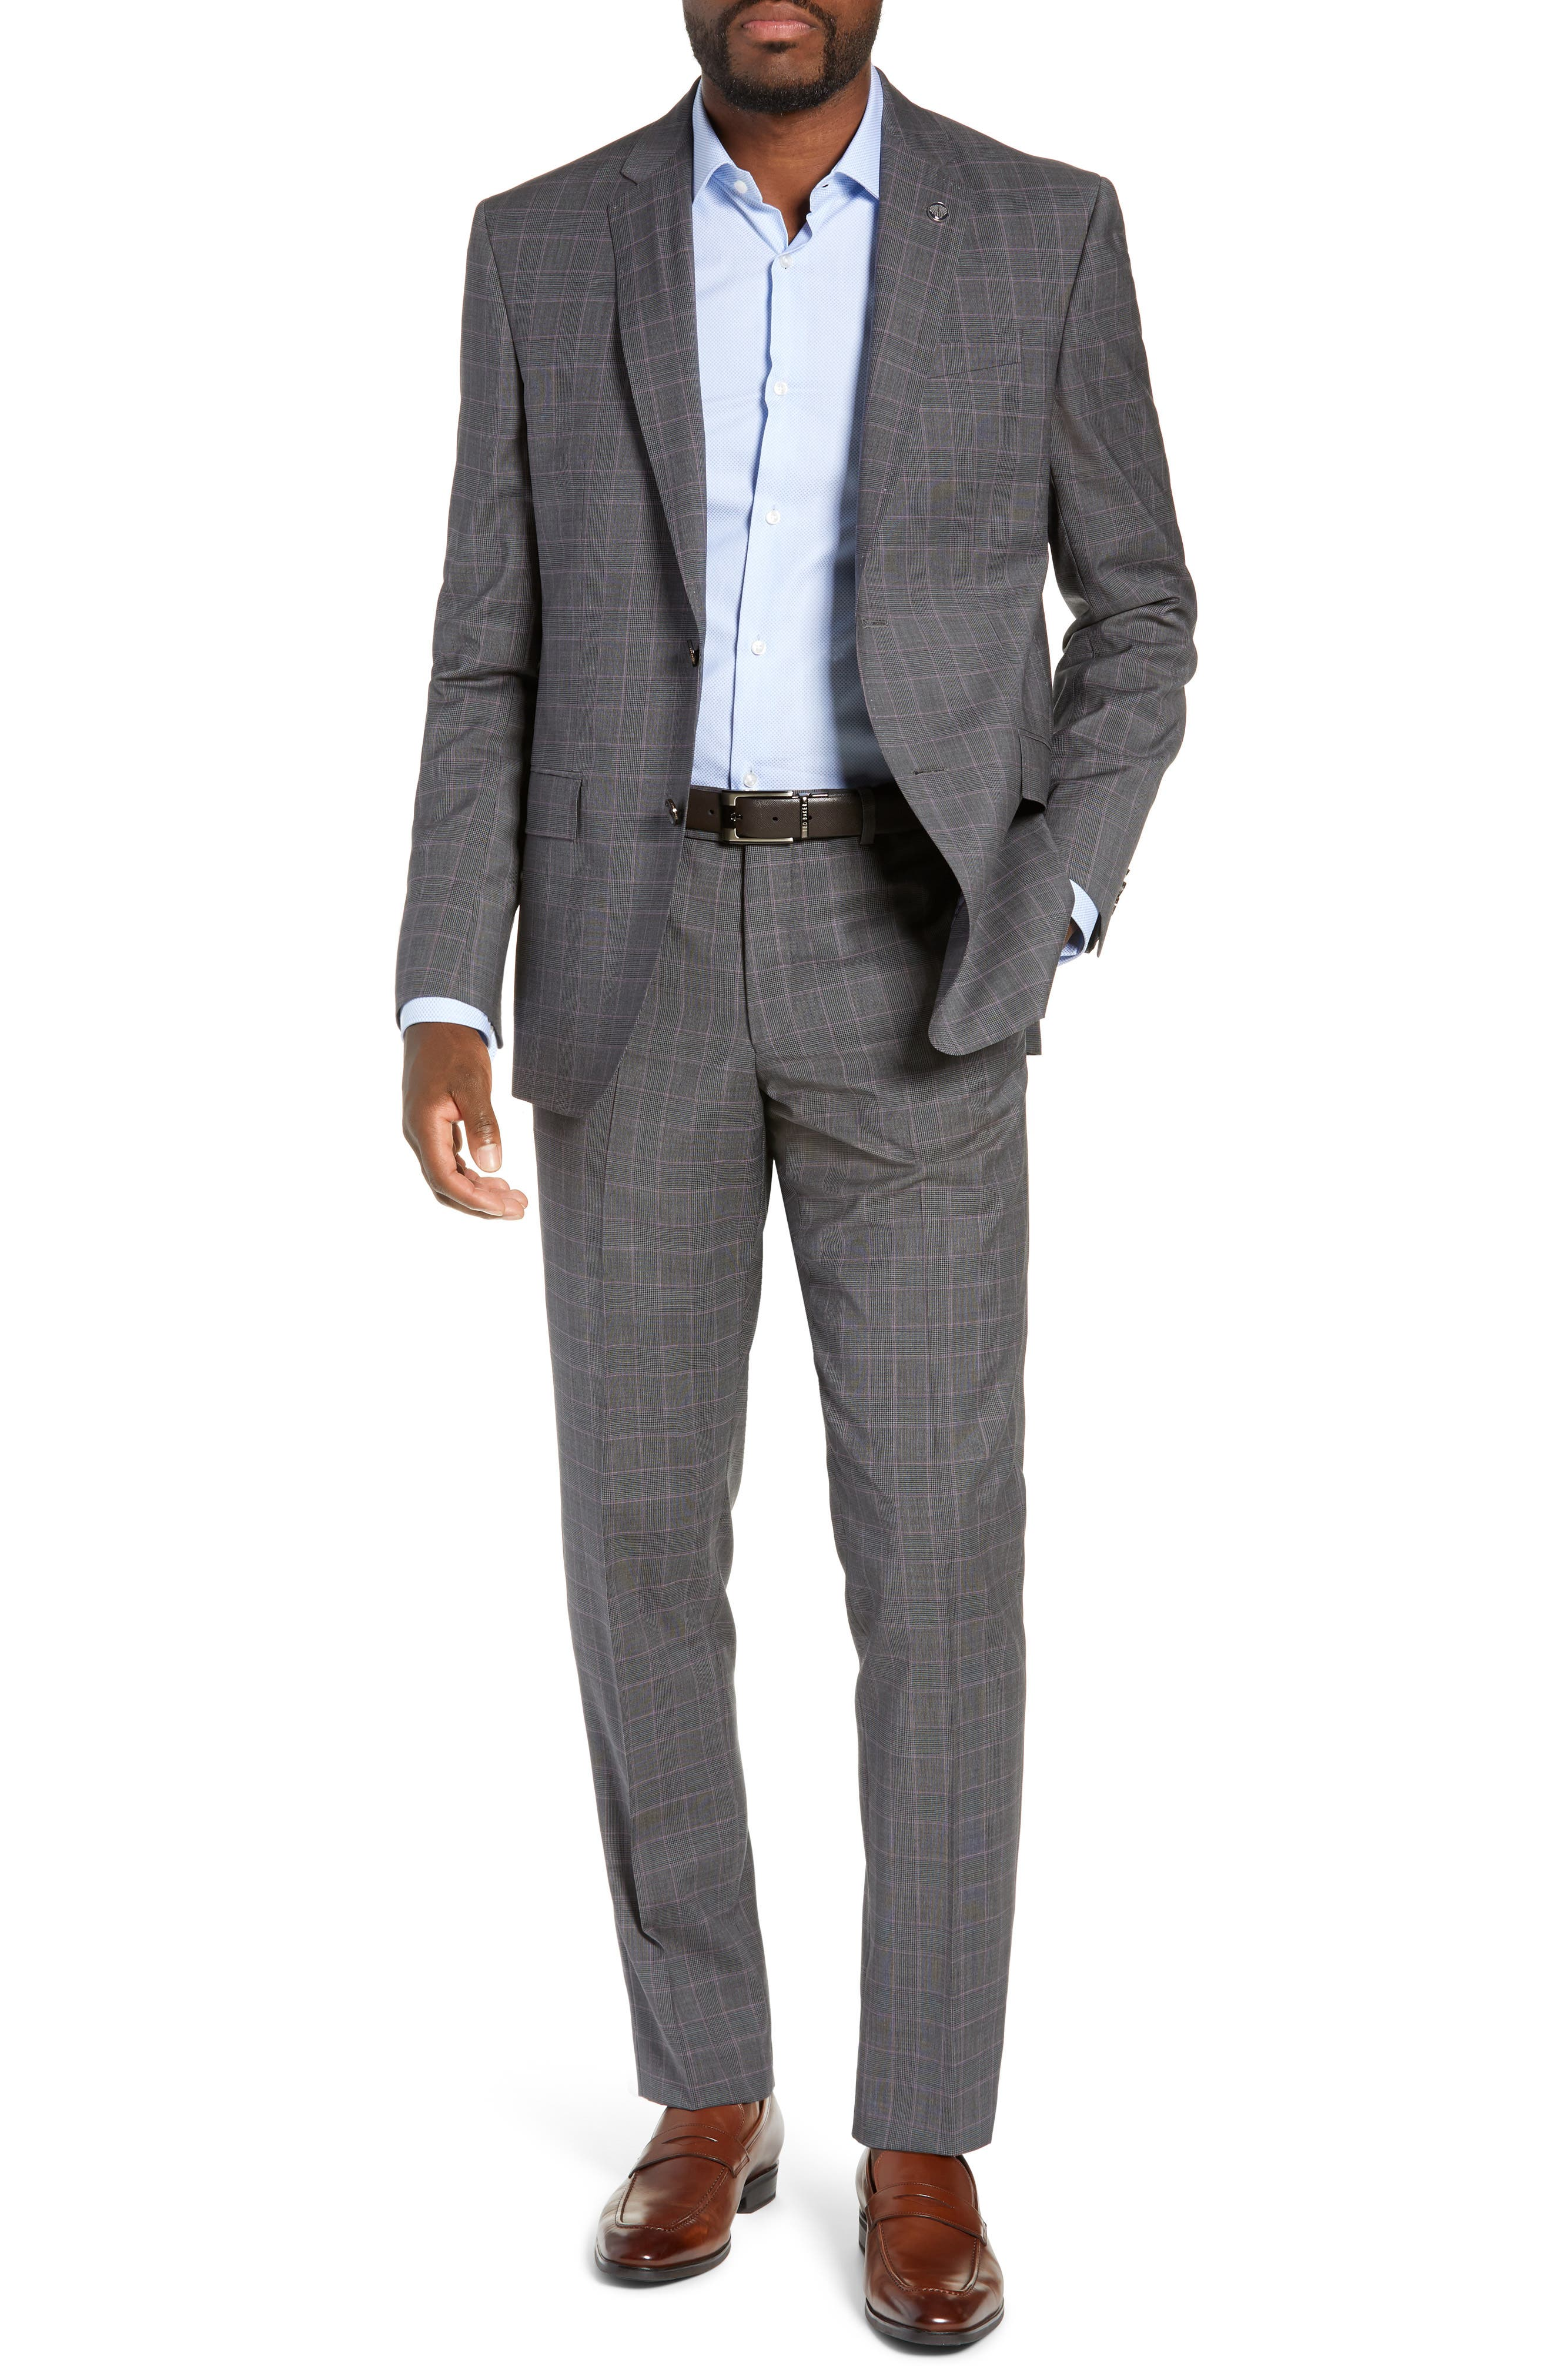 TED BAKER LONDON,                             Jay Trim Fit Plaid Wool Suit,                             Main thumbnail 1, color,                             GREY